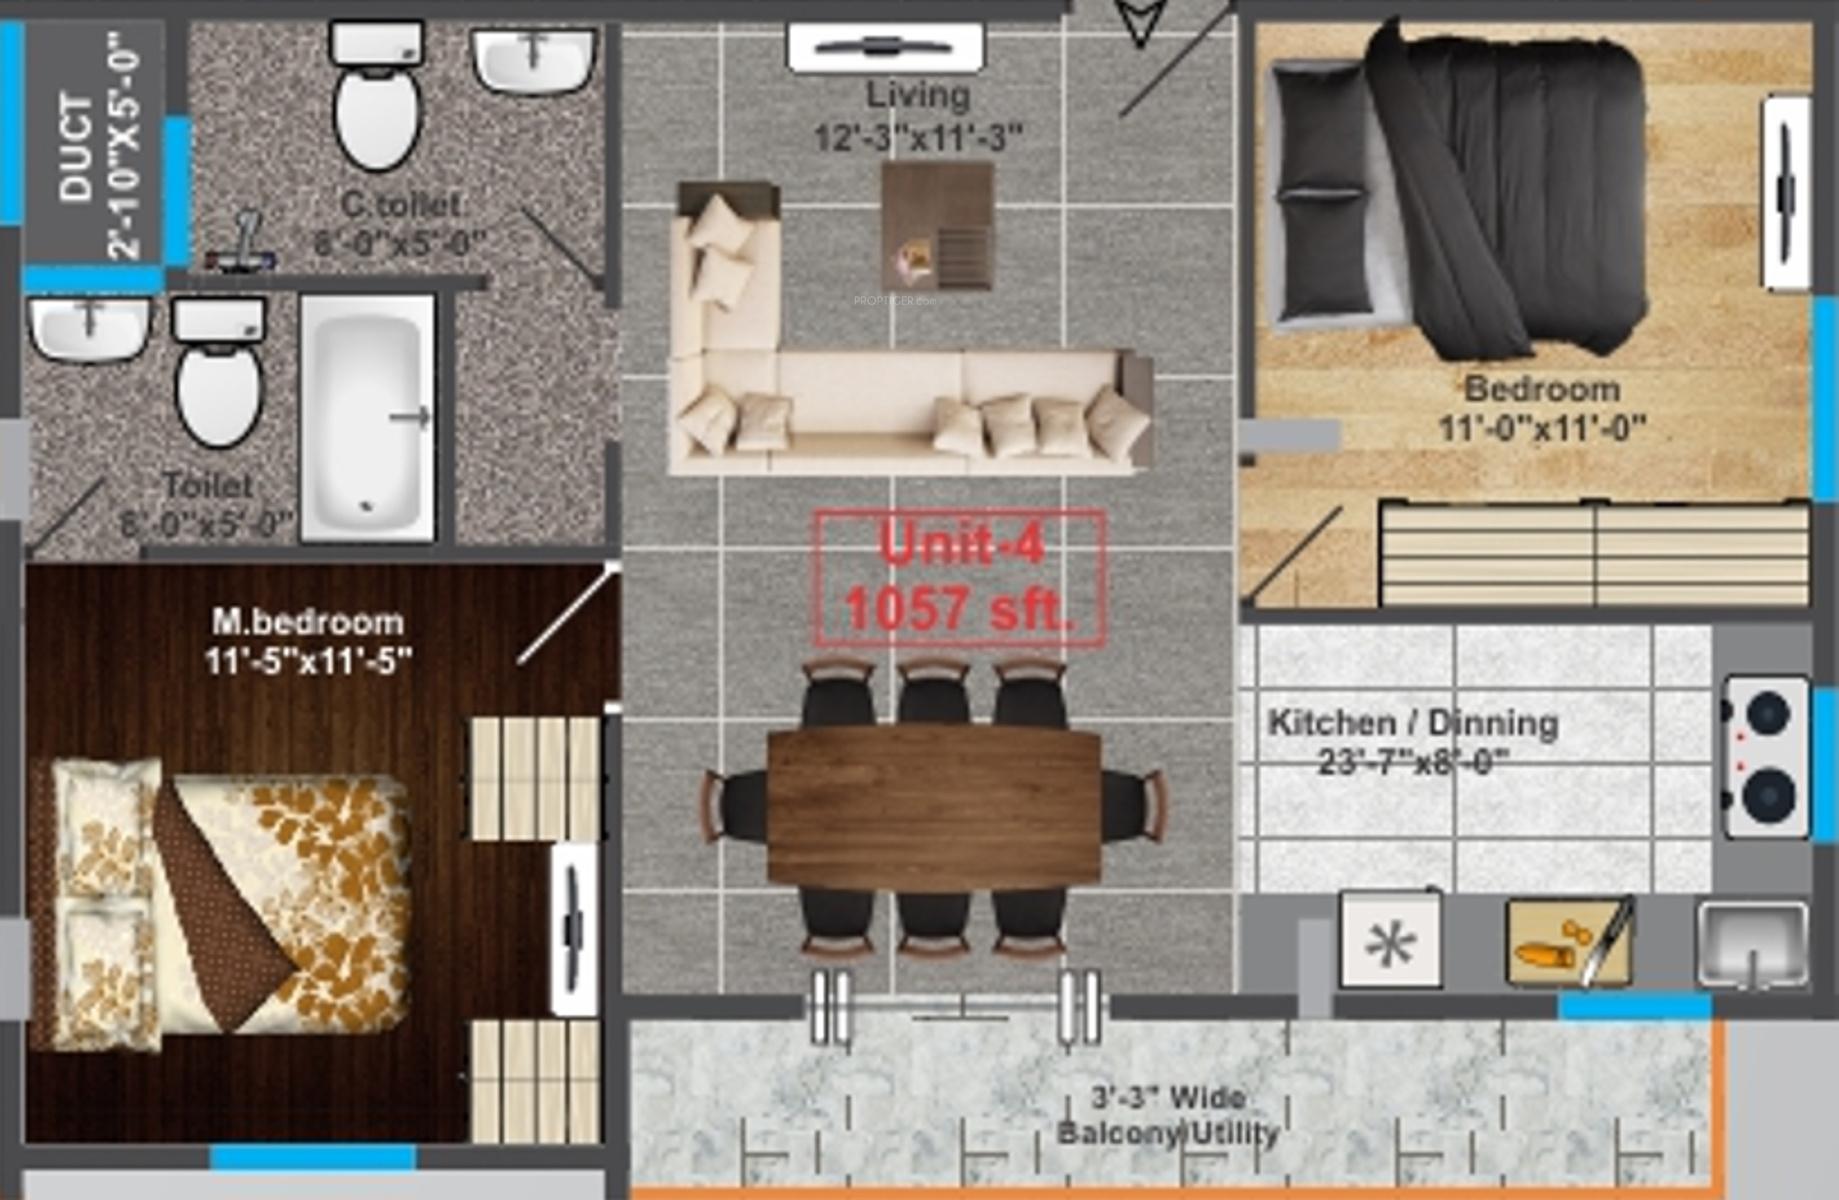 Fateh perfect casa bella in nagarbhavi bangalore price for Casa bella floor plan